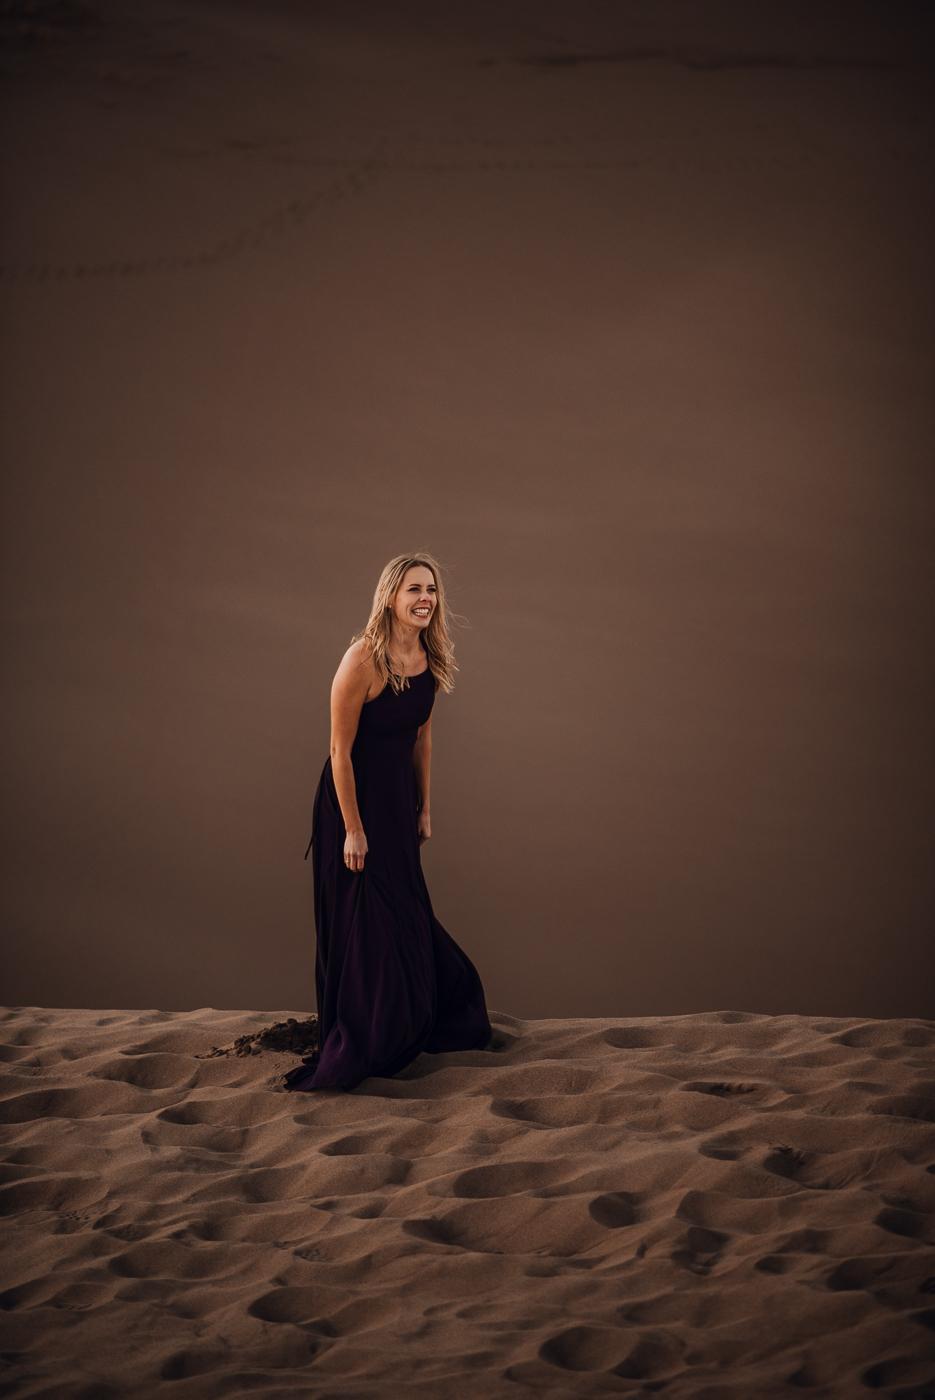 Great Sand Dunes Engagement Session PHOCO Photographer Colorado Flowy Dress Dark Moody-9.jpg